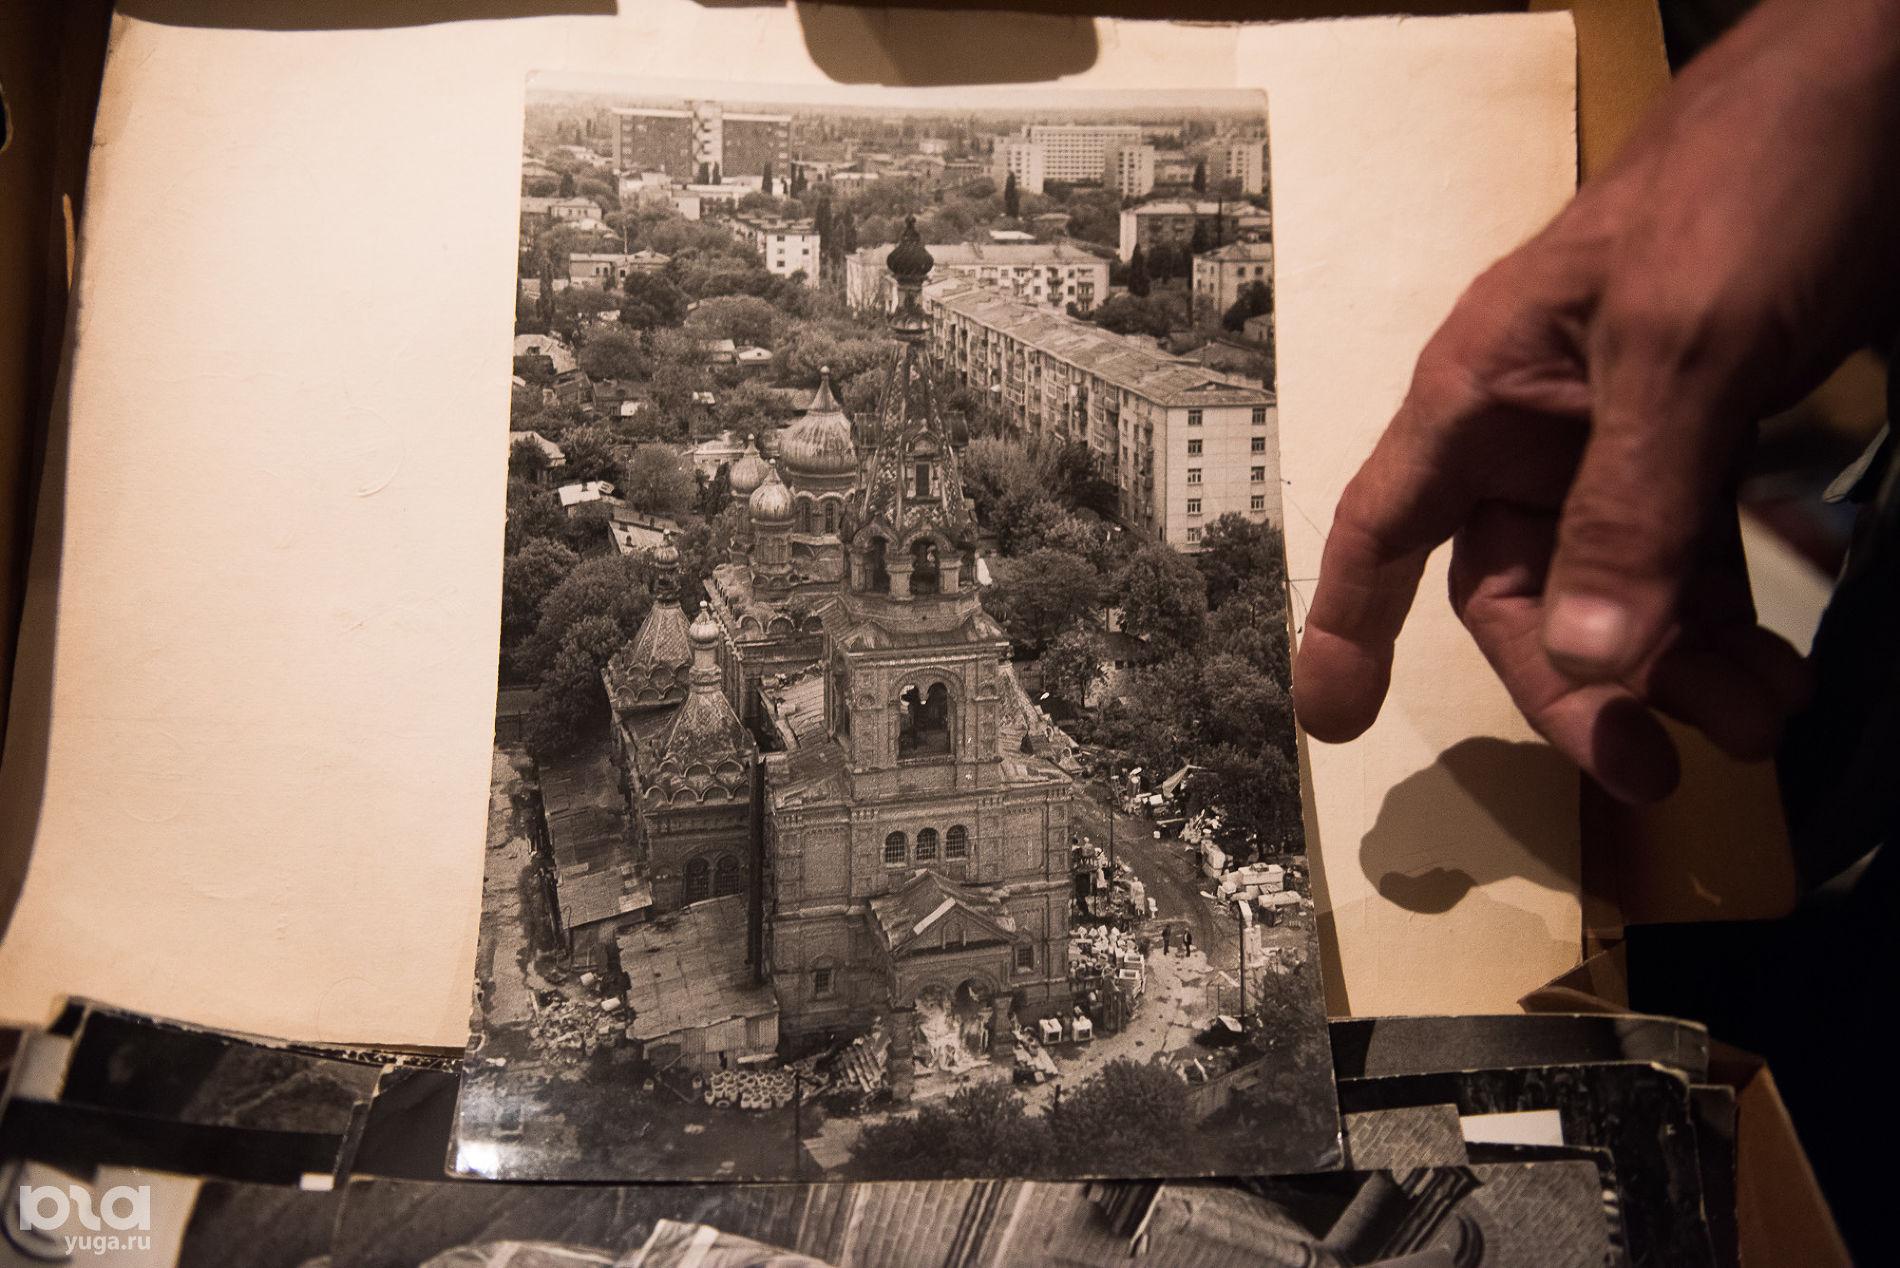 Свято-Троицкий храм в конце 1980-х гг. ©Фото Елены Синеок, Юга.ру